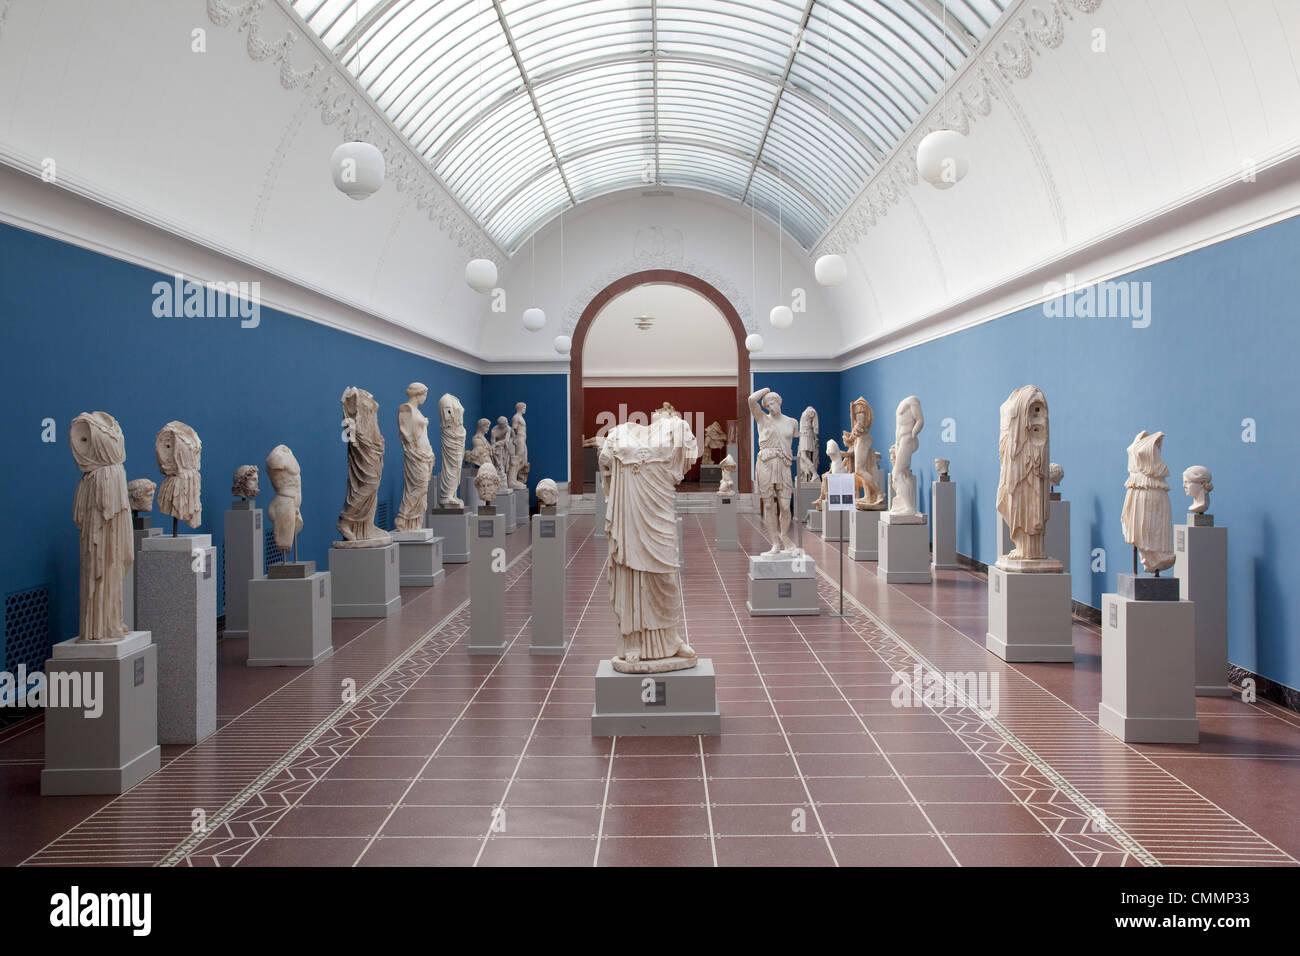 Interior, NY Carlesberg Glyptotek Art Museum, Copenhagen, Denmark, Scandinavia, Europe Stock Photo